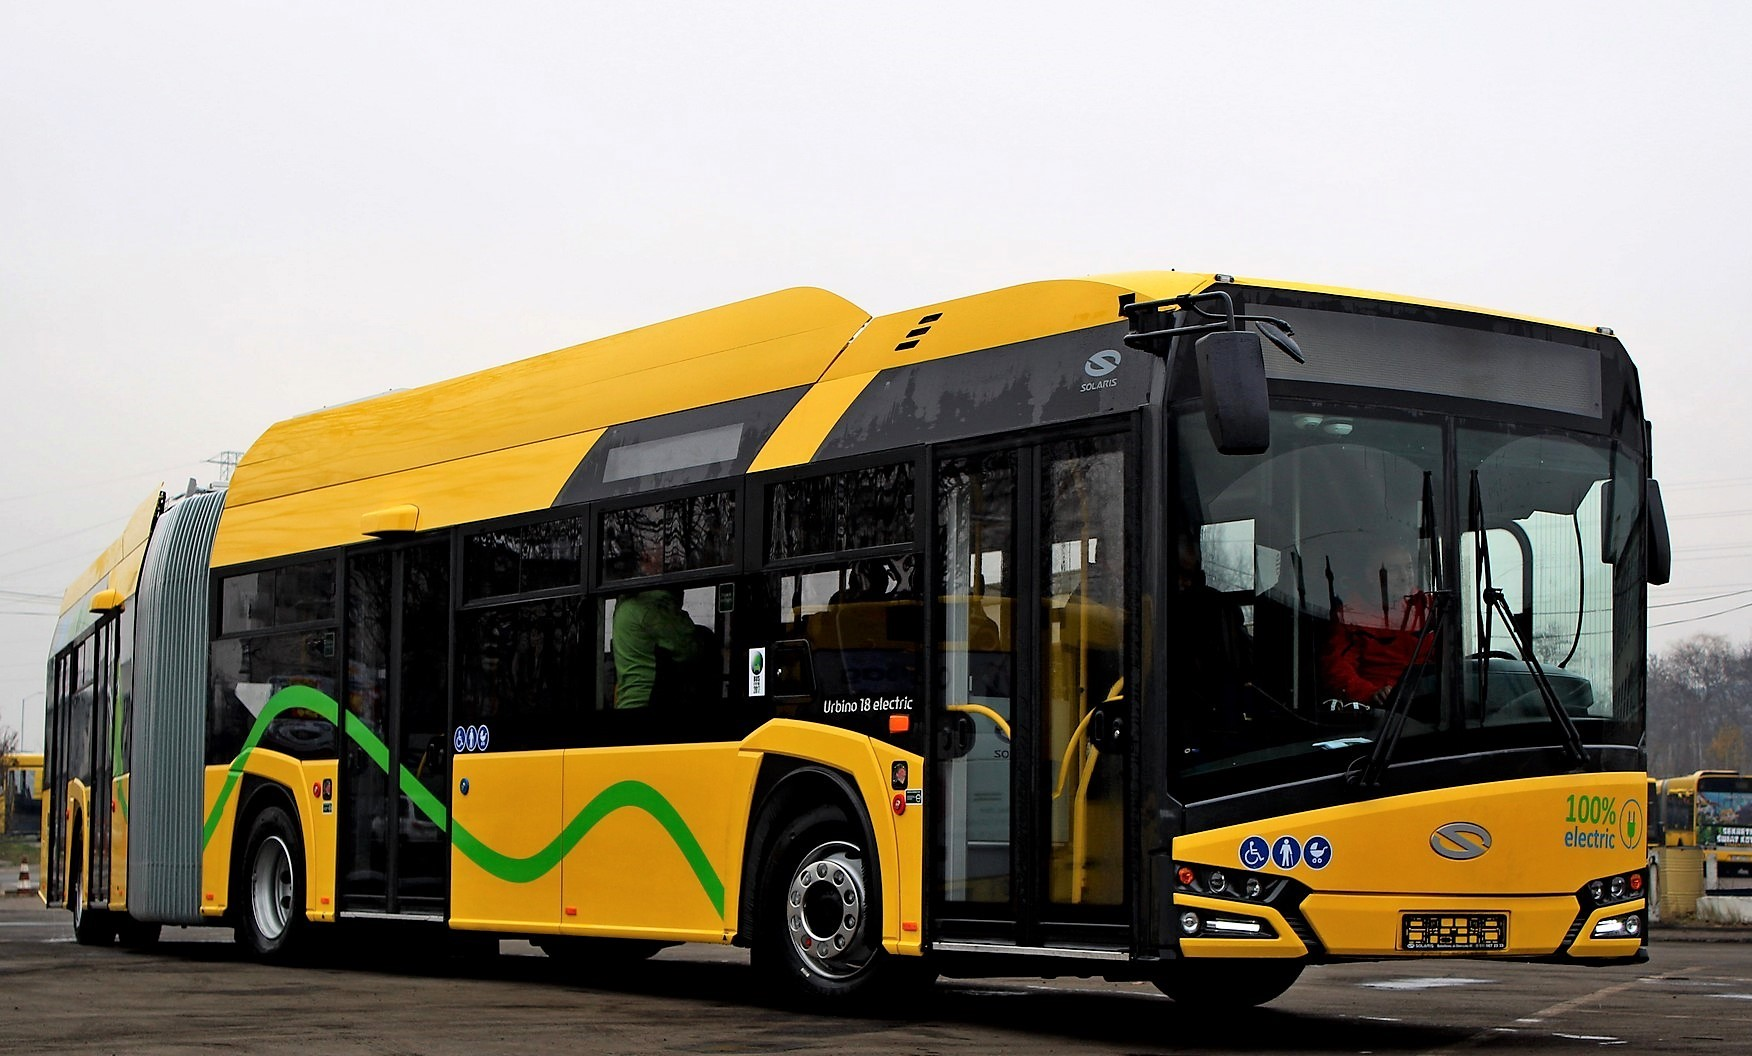 Autobus Solaris Urbino 18 electric dodaný do Katovic počátkem letošního roku. (foto: Solaris Bus & Coach)